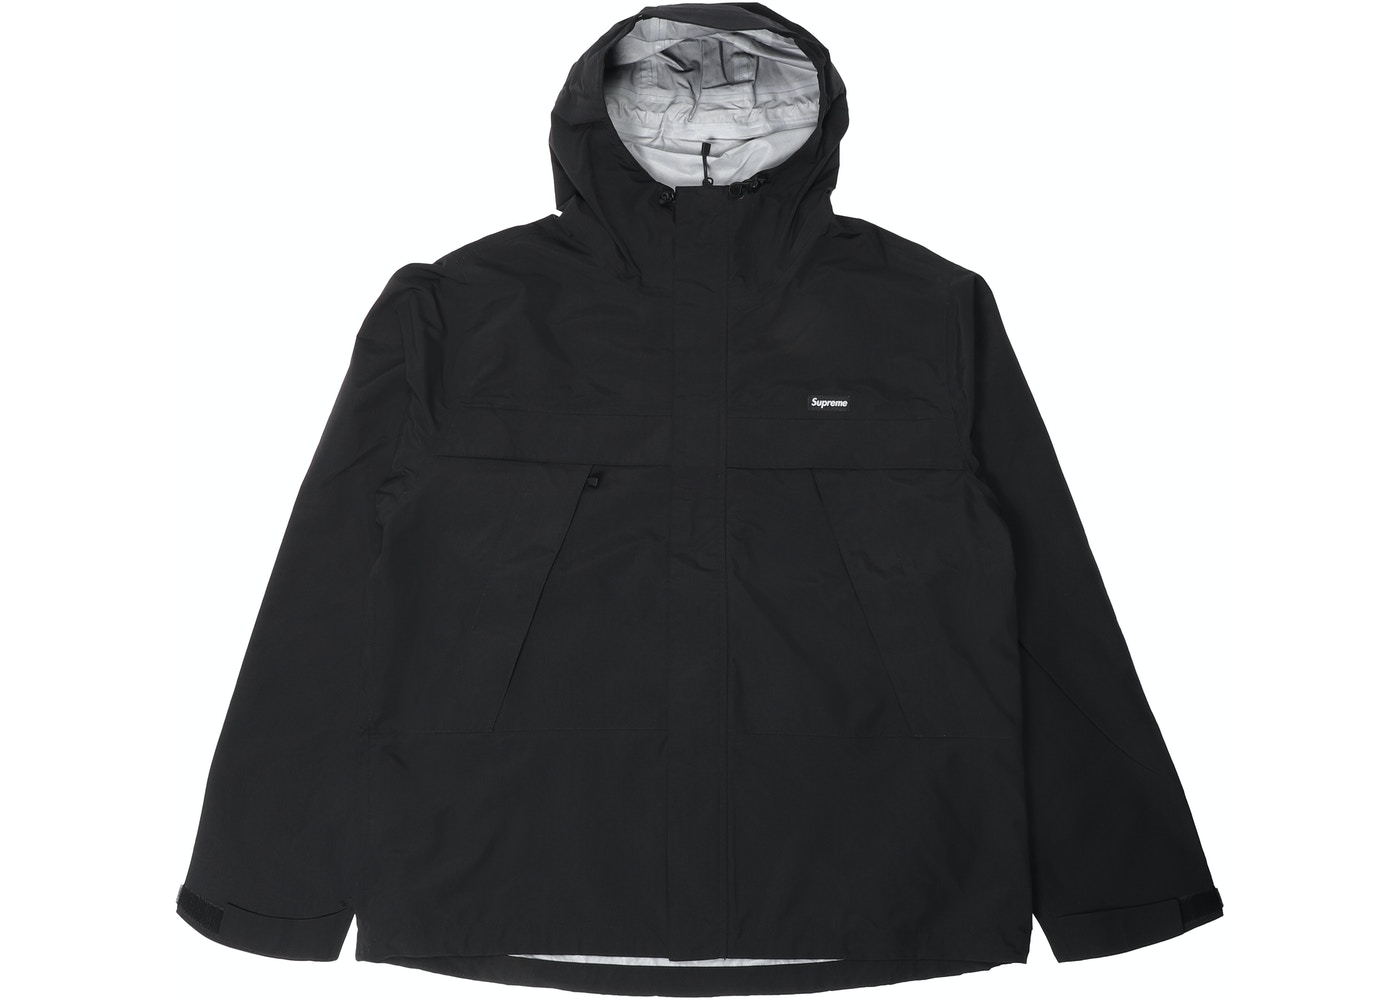 Supreme Dog Taped Seam Jacket Jacket Black